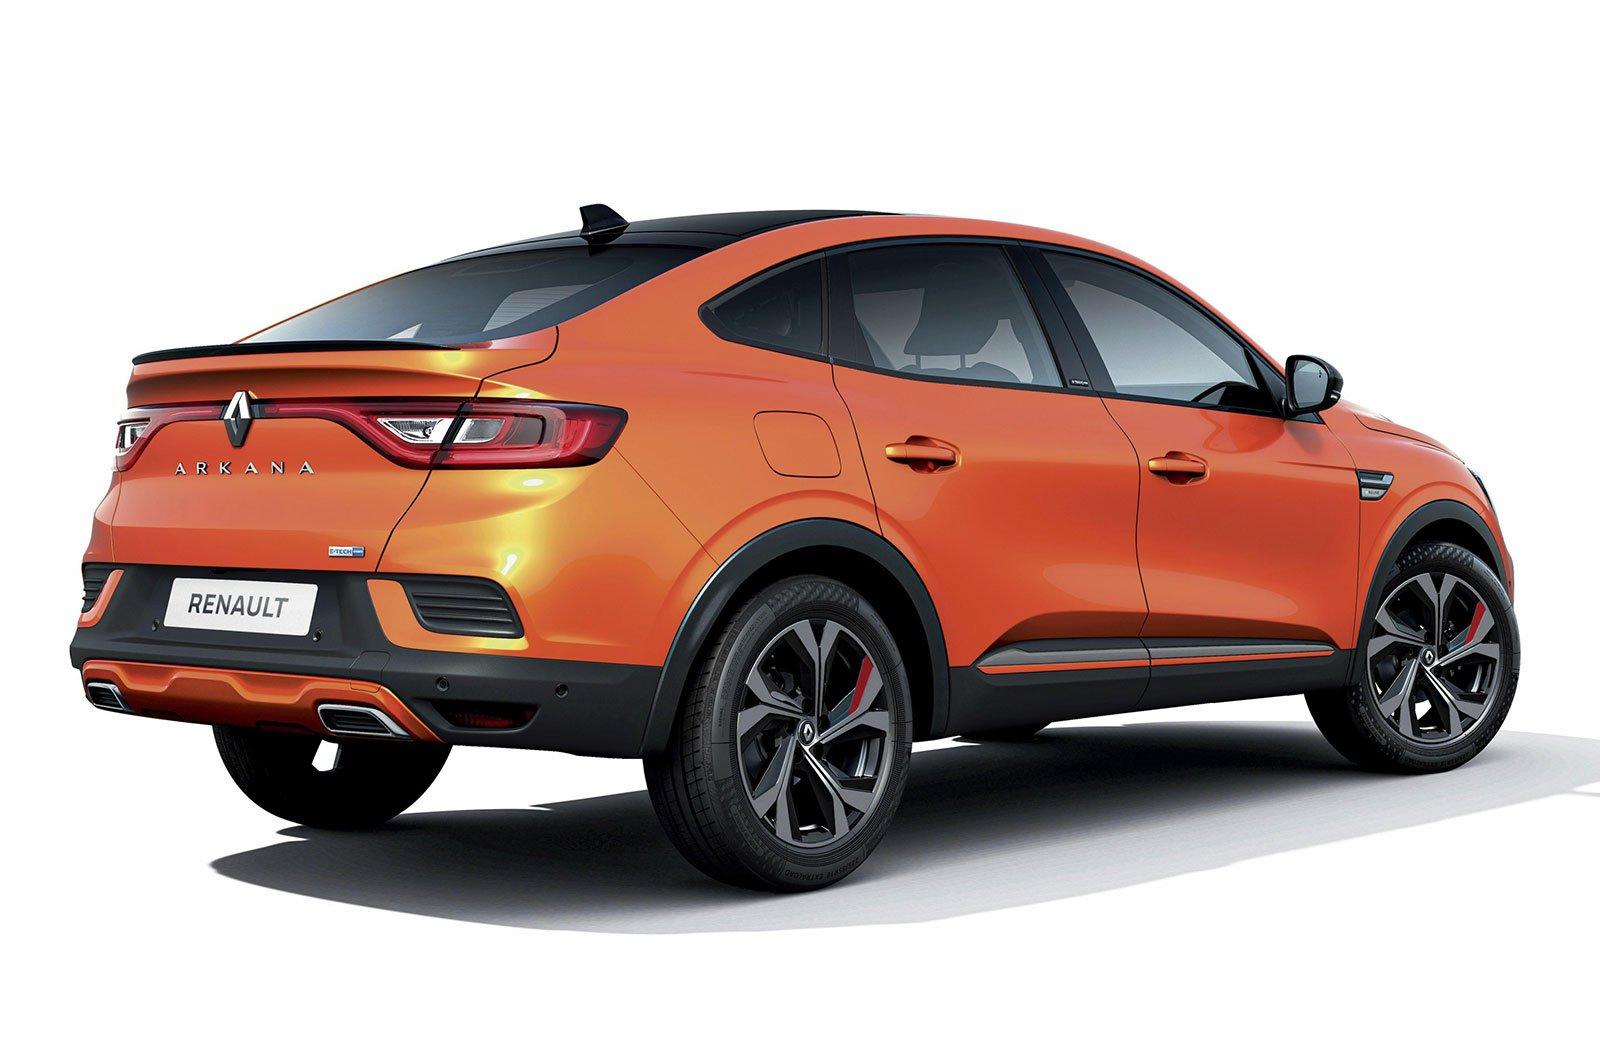 2021 Renault Arkana rear